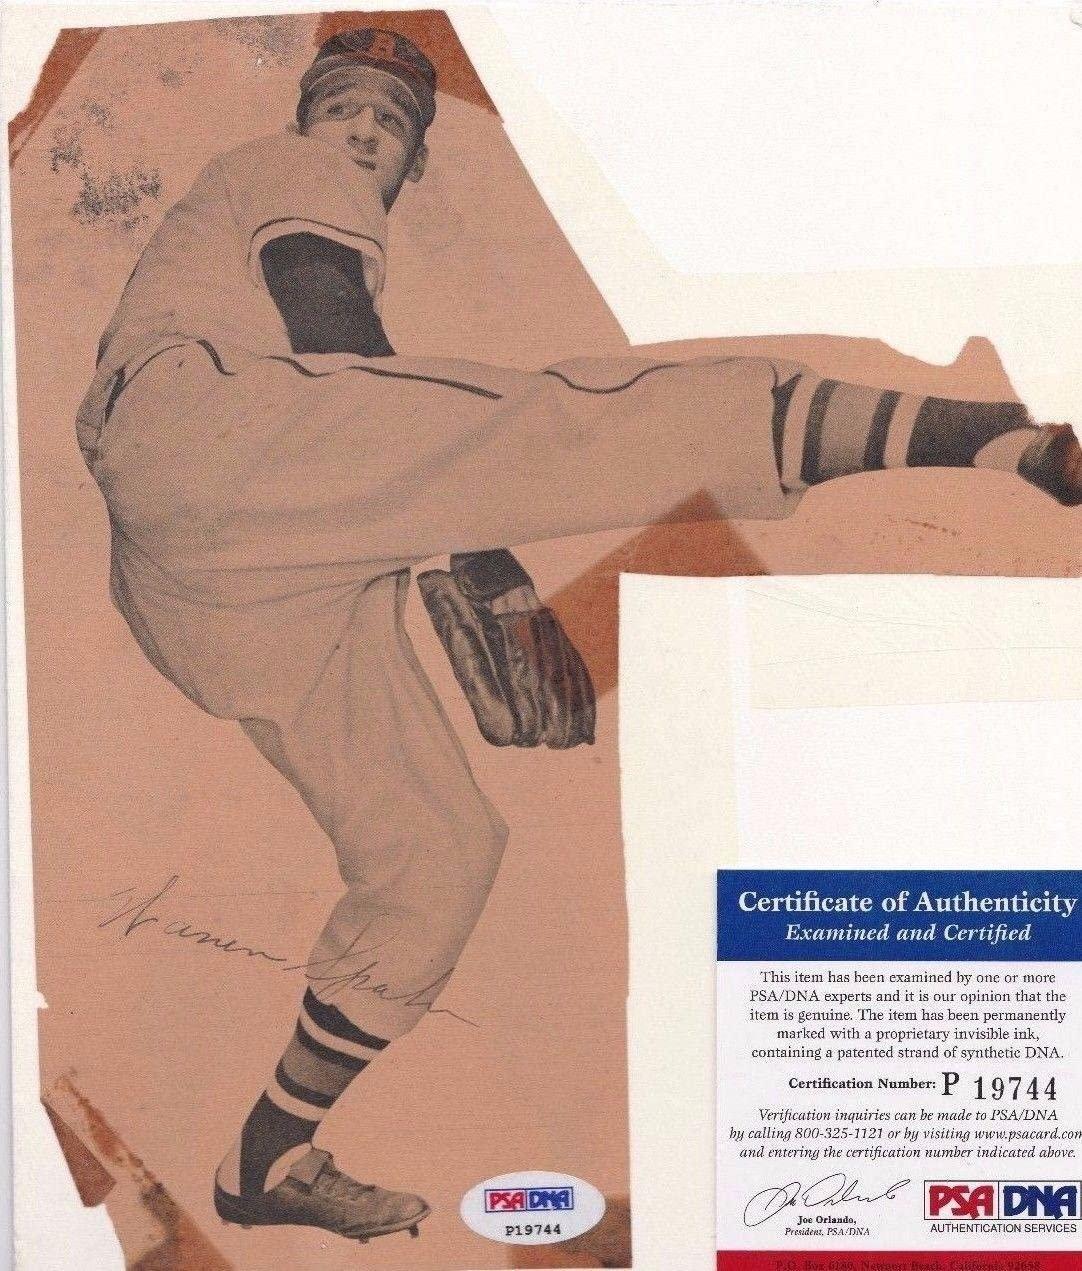 Warren Spahn Signed Vintage Milwaukee Brewers Baseball Magazine Cut P19744 - PSA/DNA Certified - Autographed MLB Magazines